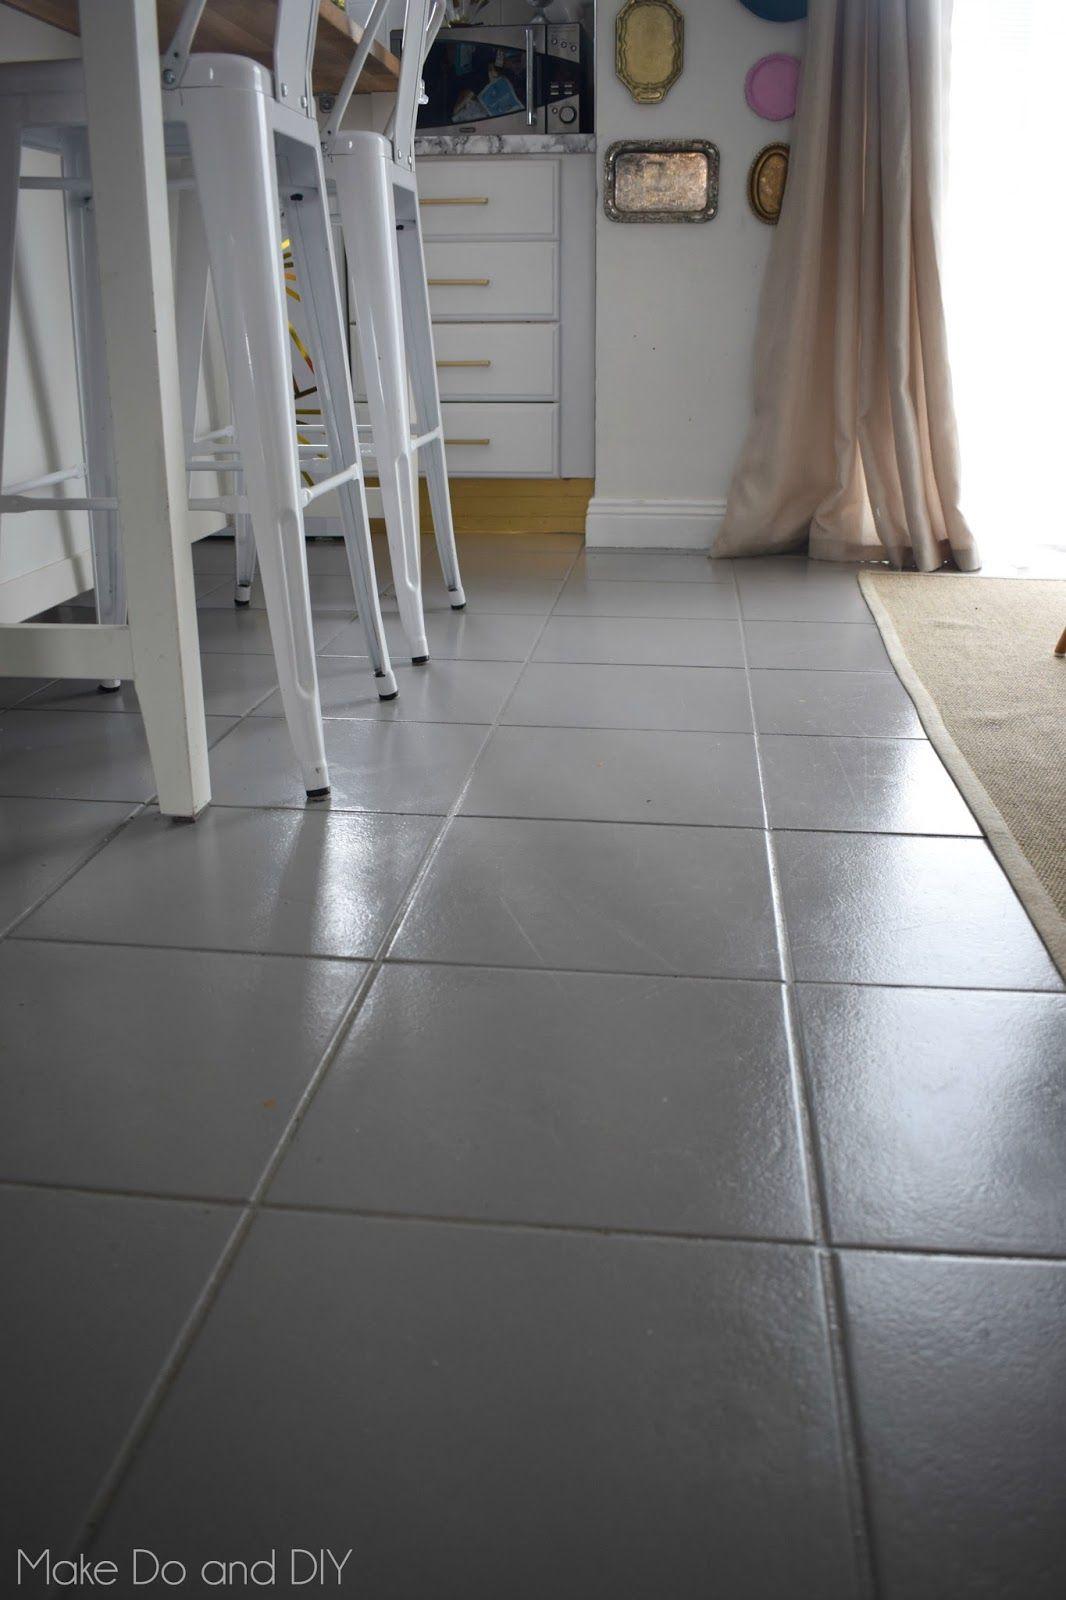 Painted Tile Floor Six Months Later Make Do And Diy Painting Tile Floors Painting Ceramic Tile Floor Tile Floor